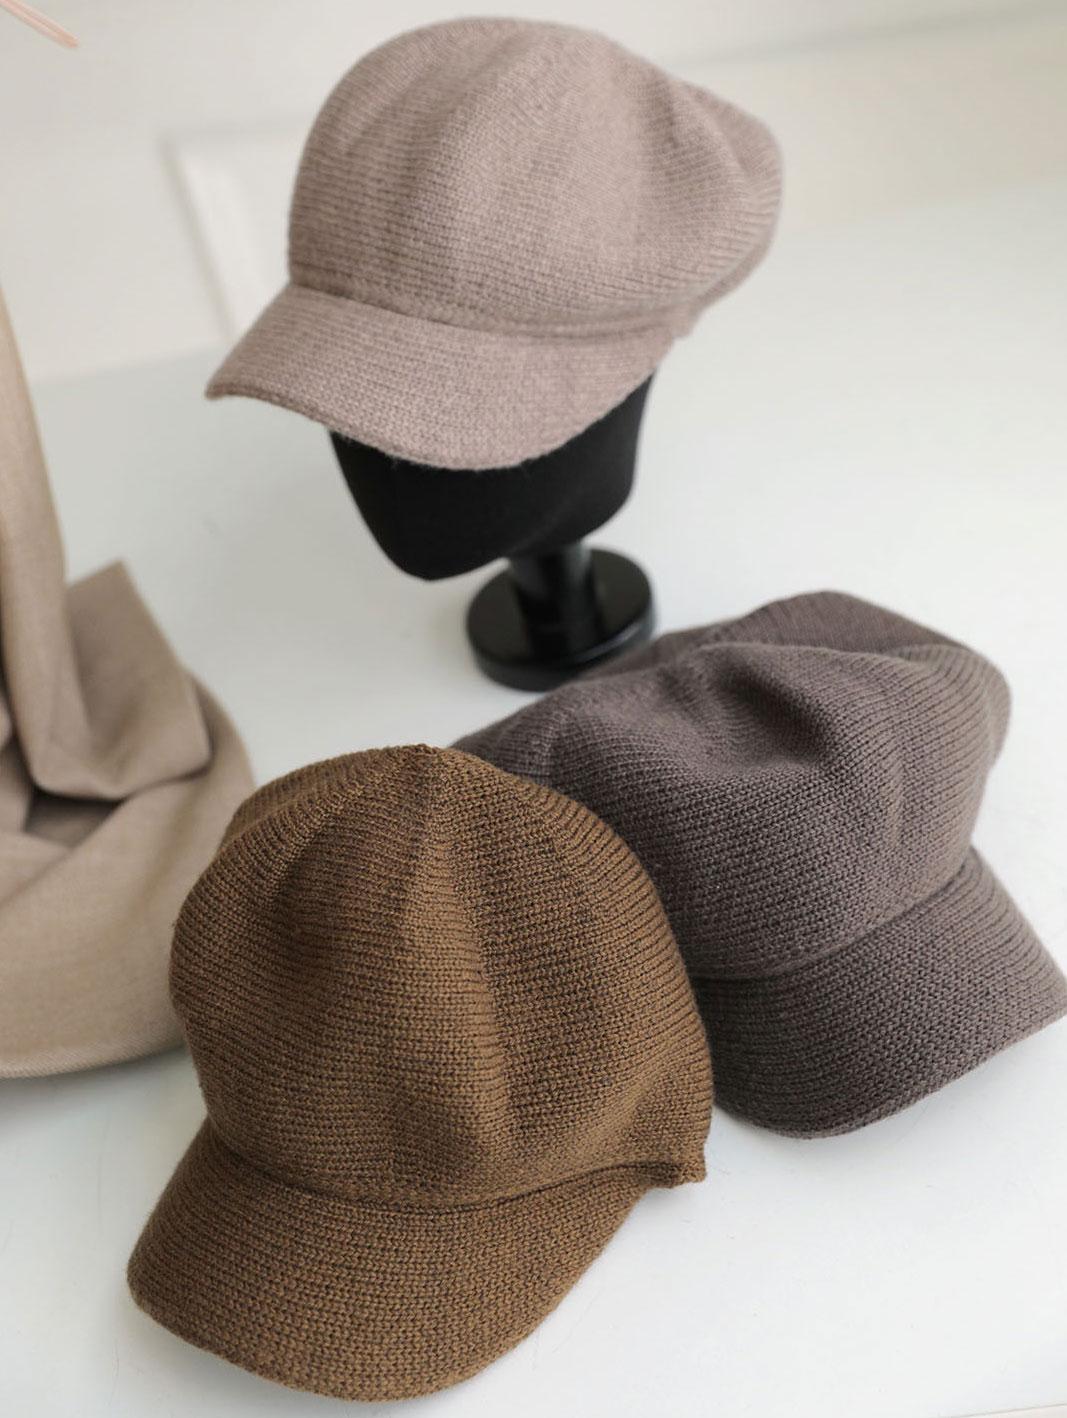 AC-565 Warm Soft Knit Ball Cap